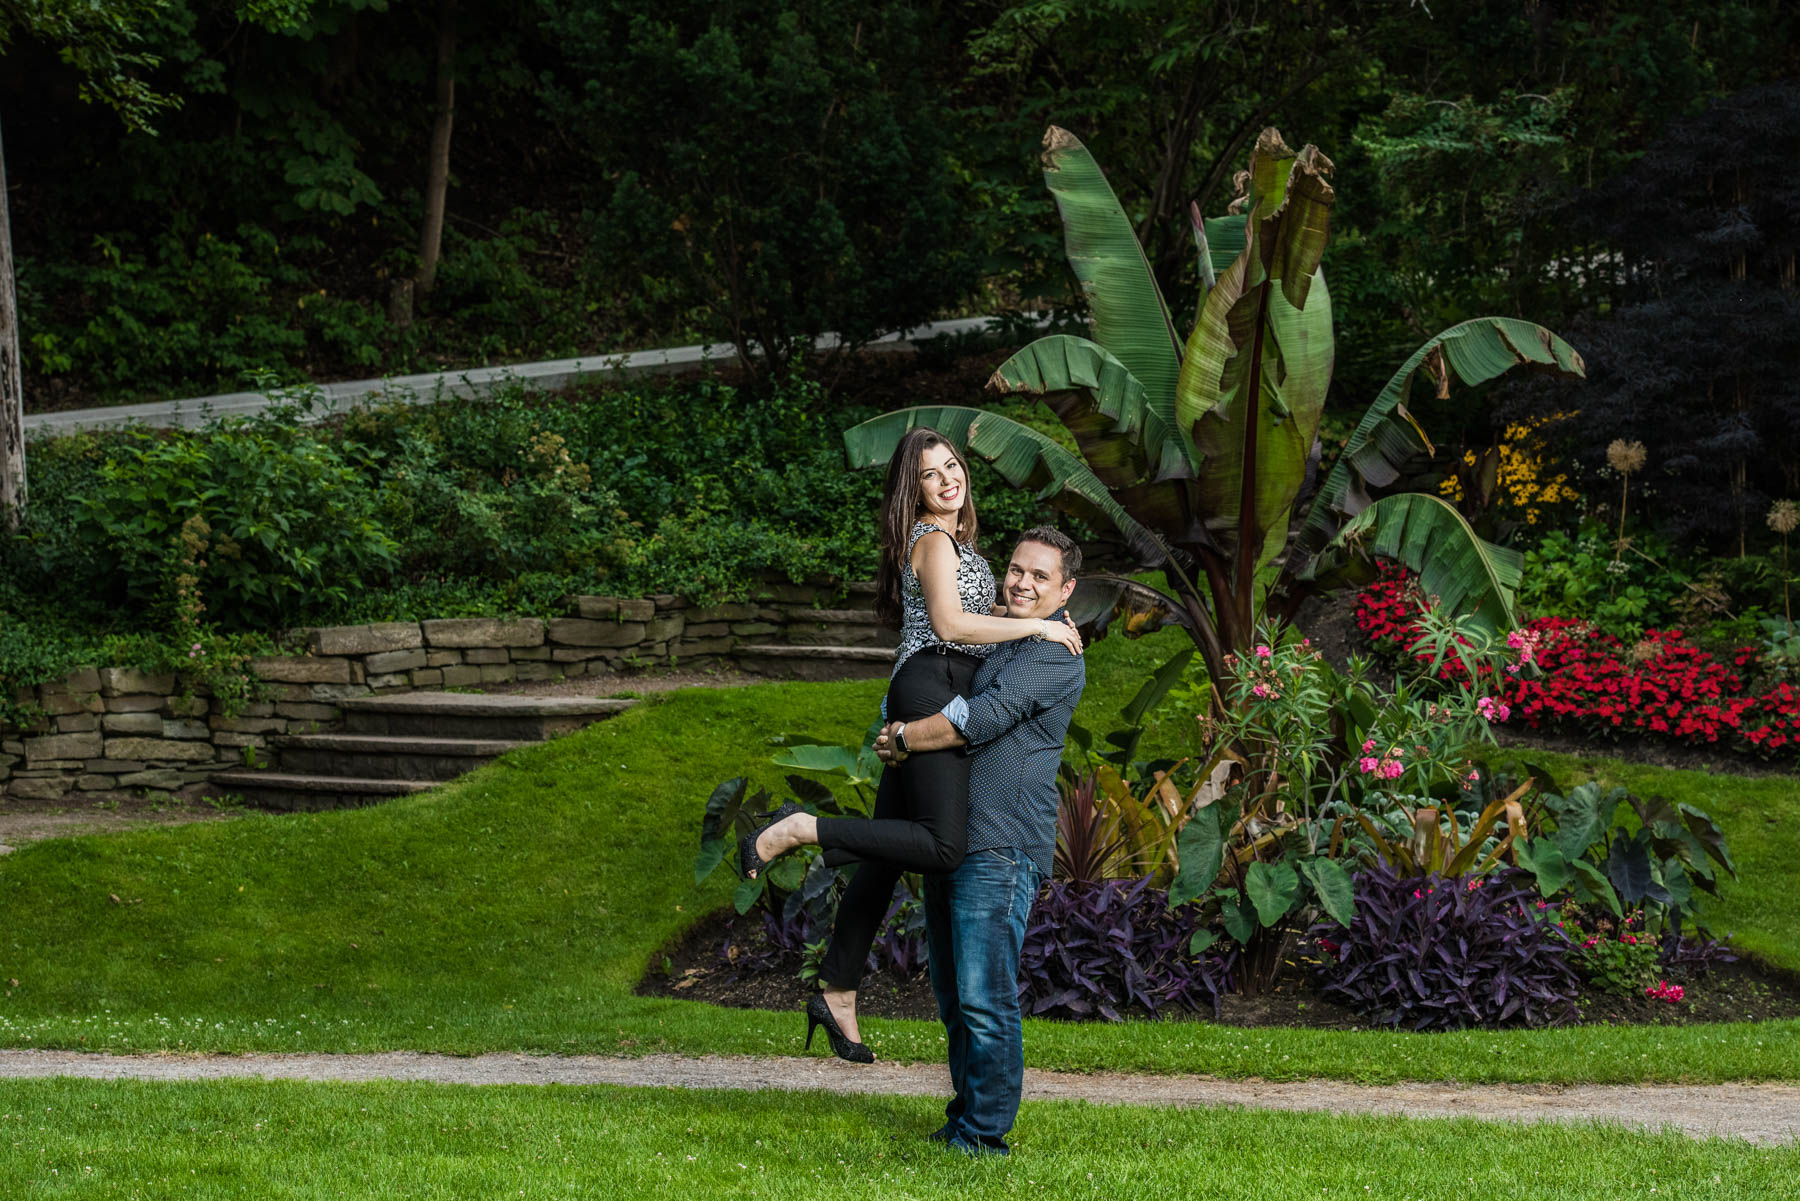 048 - Engagement JJ Alexander Muir Memorial Gardens